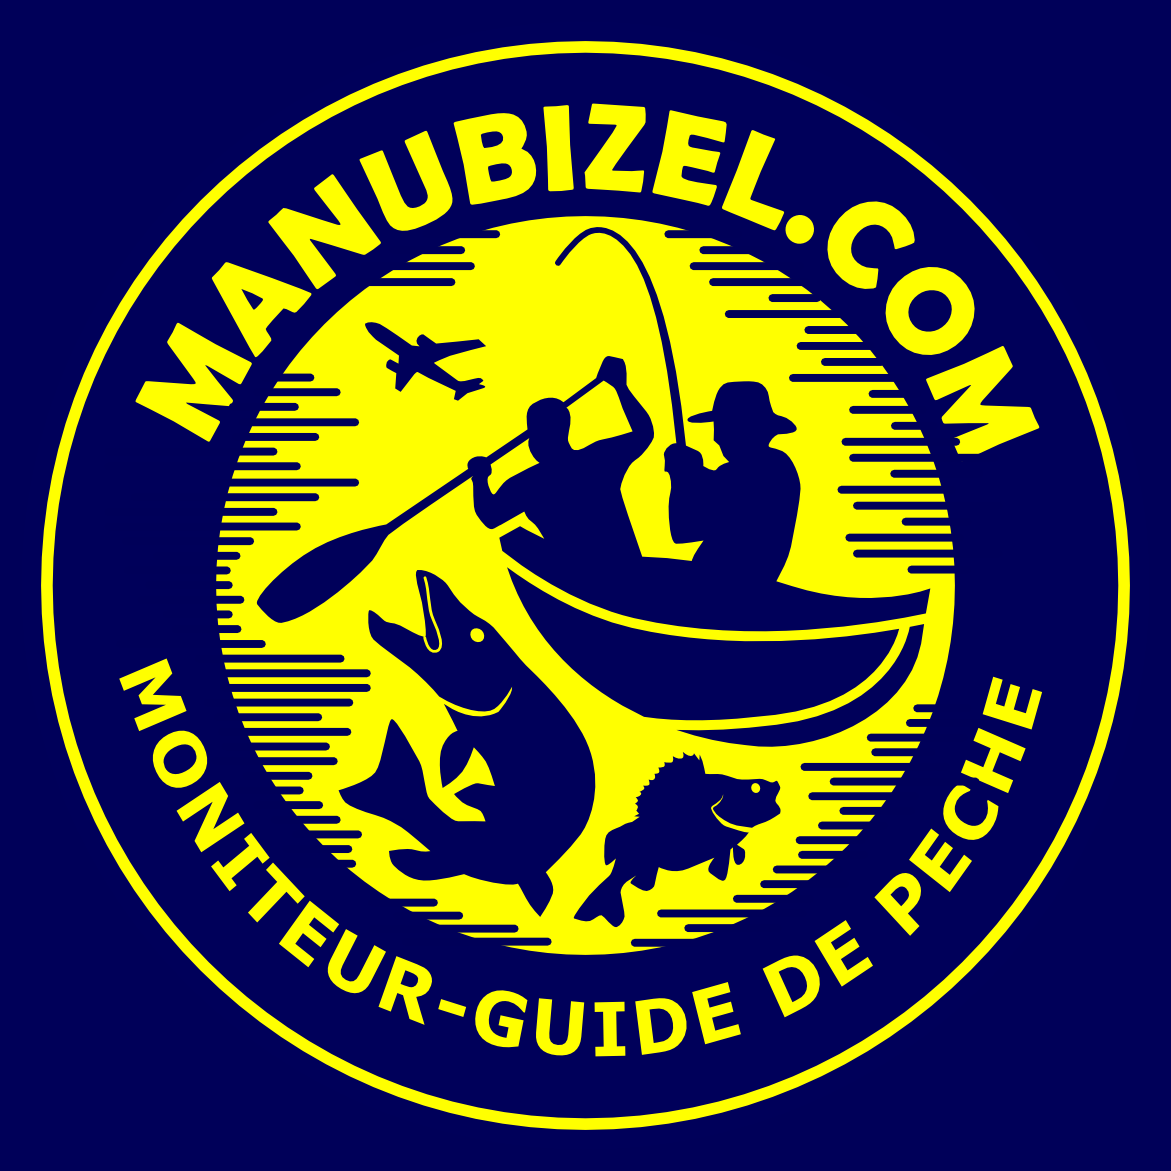 Manu Bizel moniteur guide de pêche